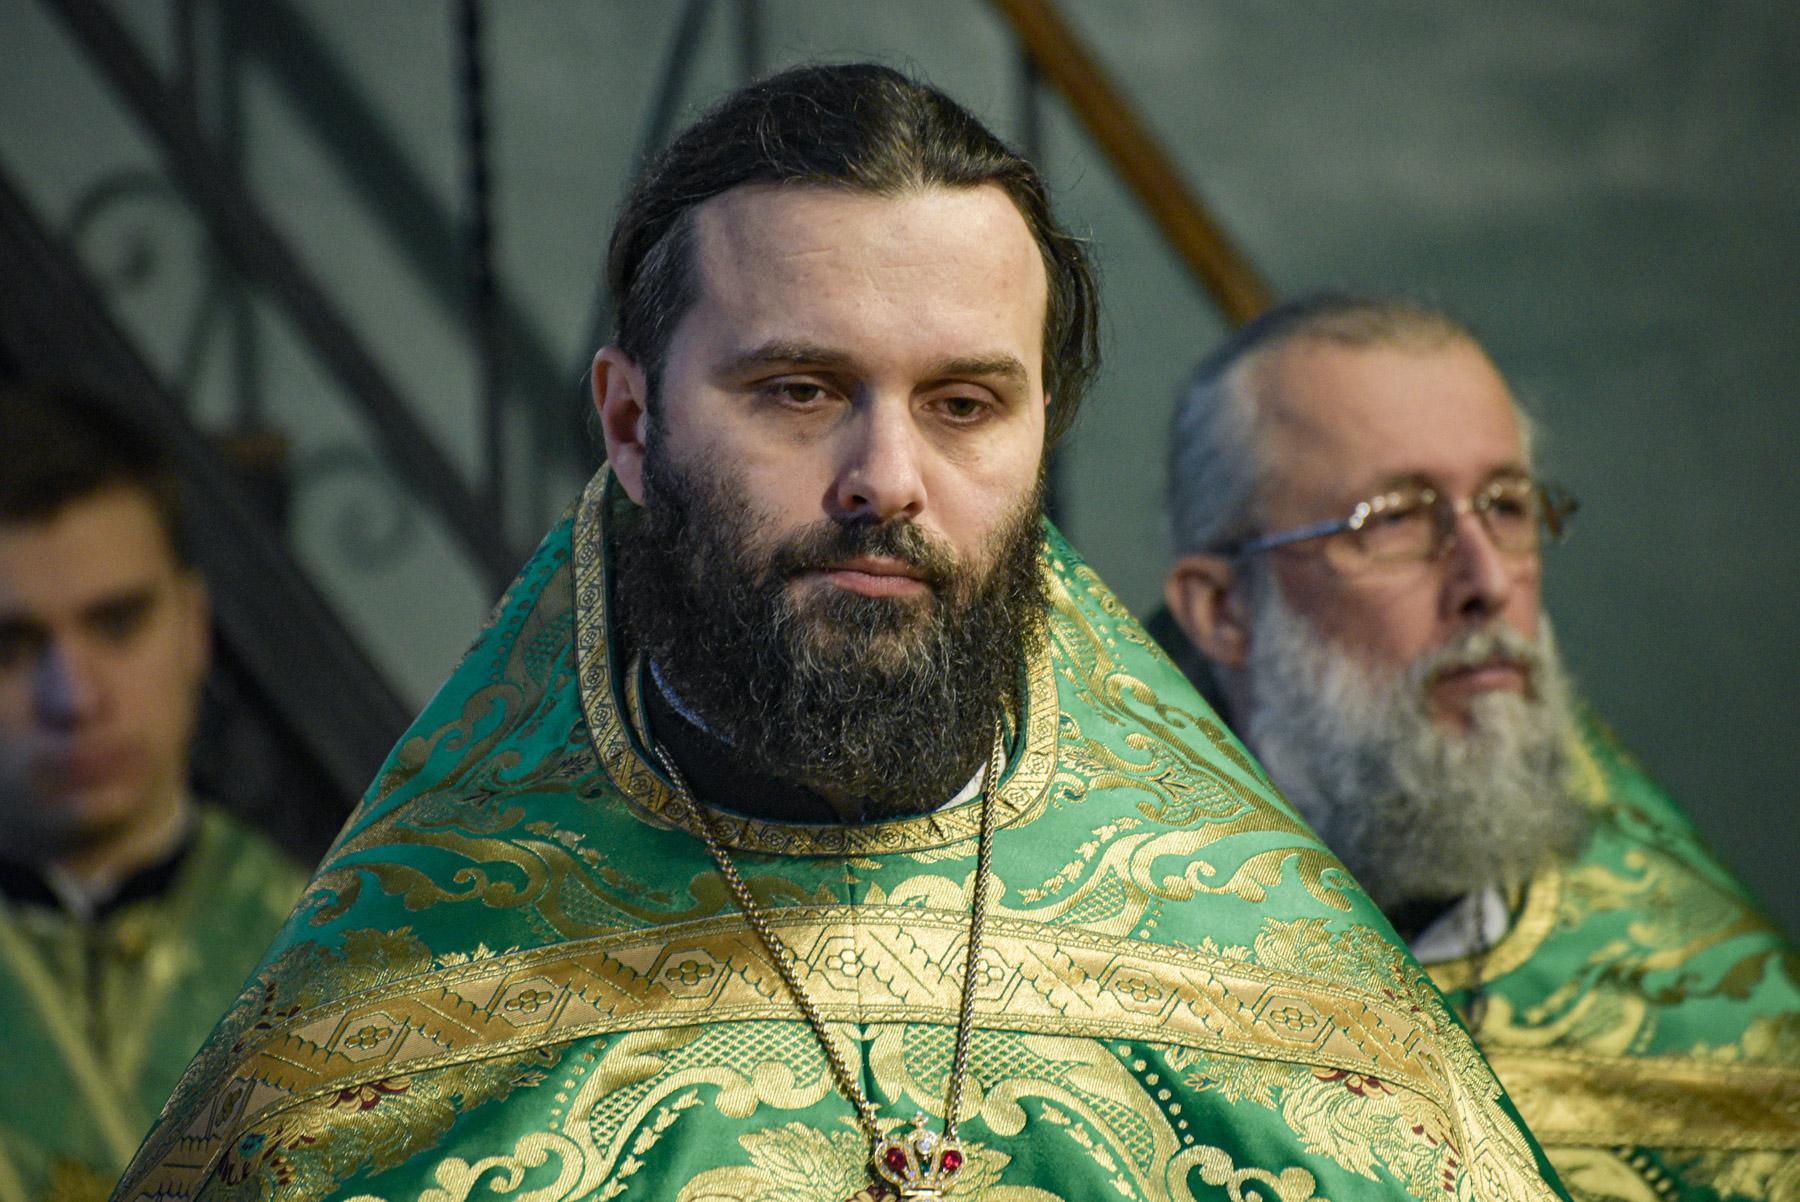 photos of orthodox christmas 0177 2